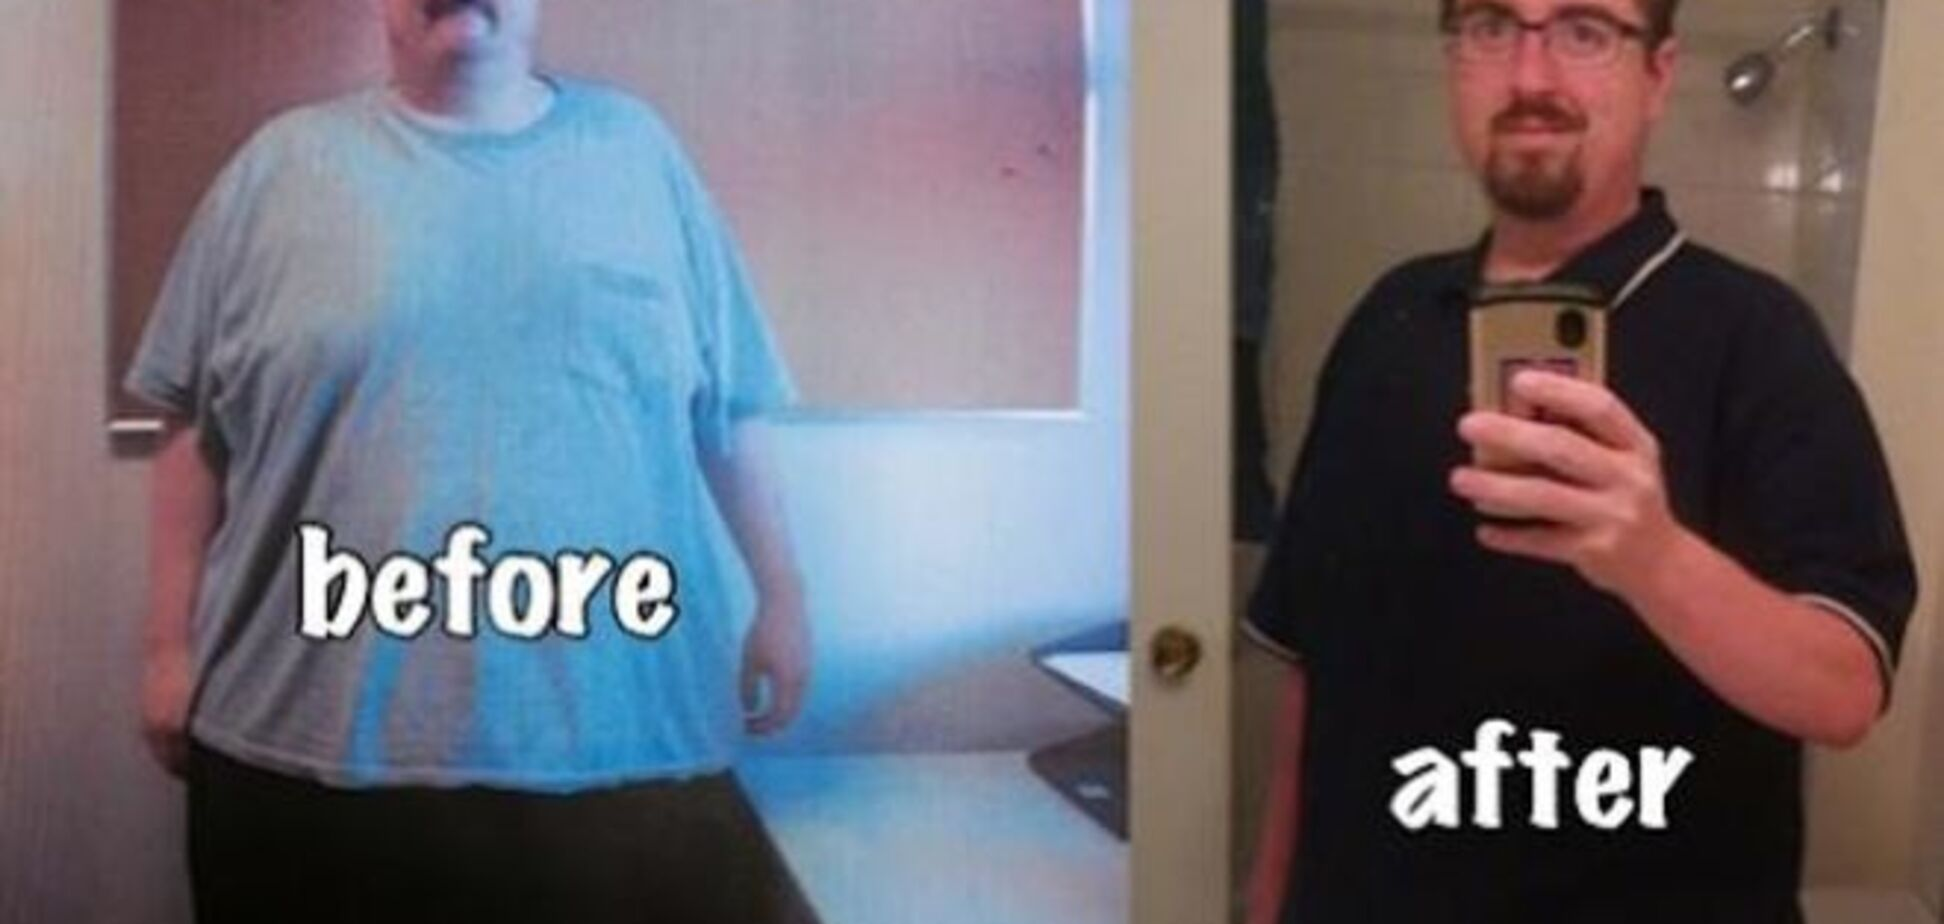 Мужчина похудел на 63 кг благодаря онлайн-игре. Фотофакт